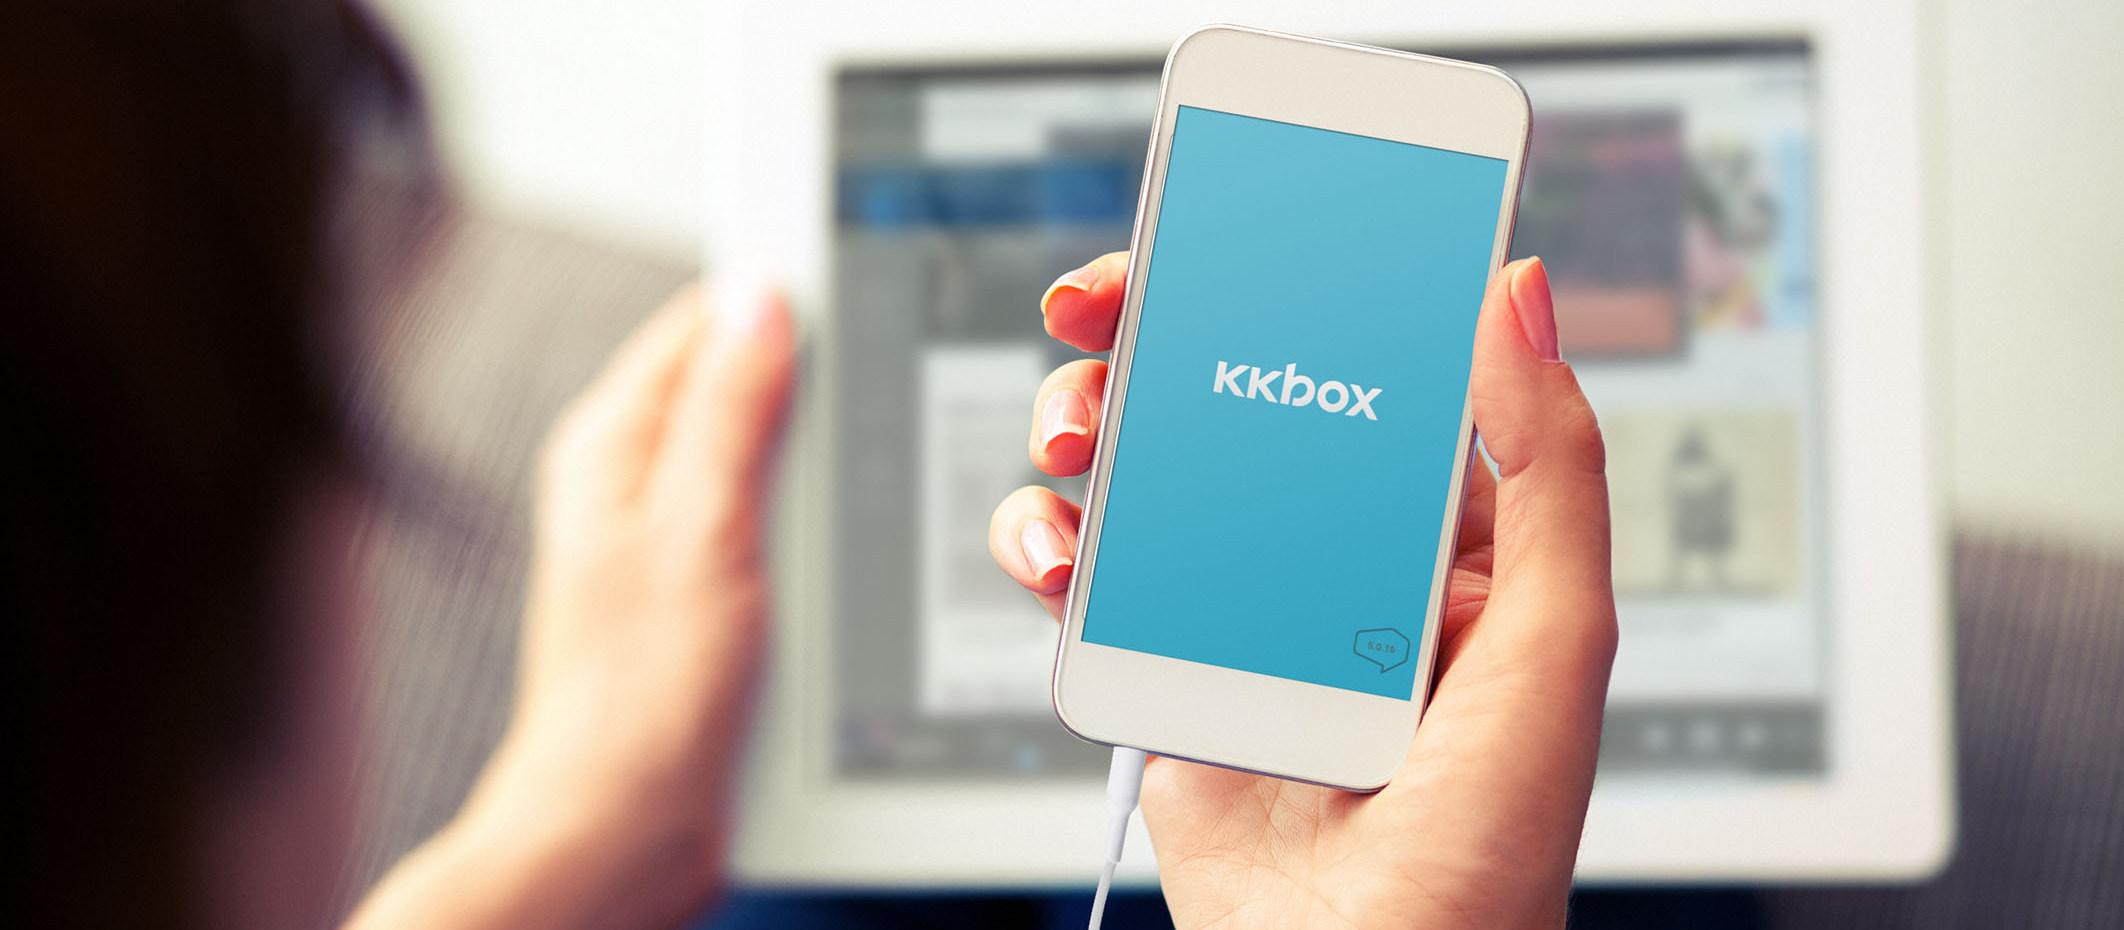 KKBOX_2 (1)